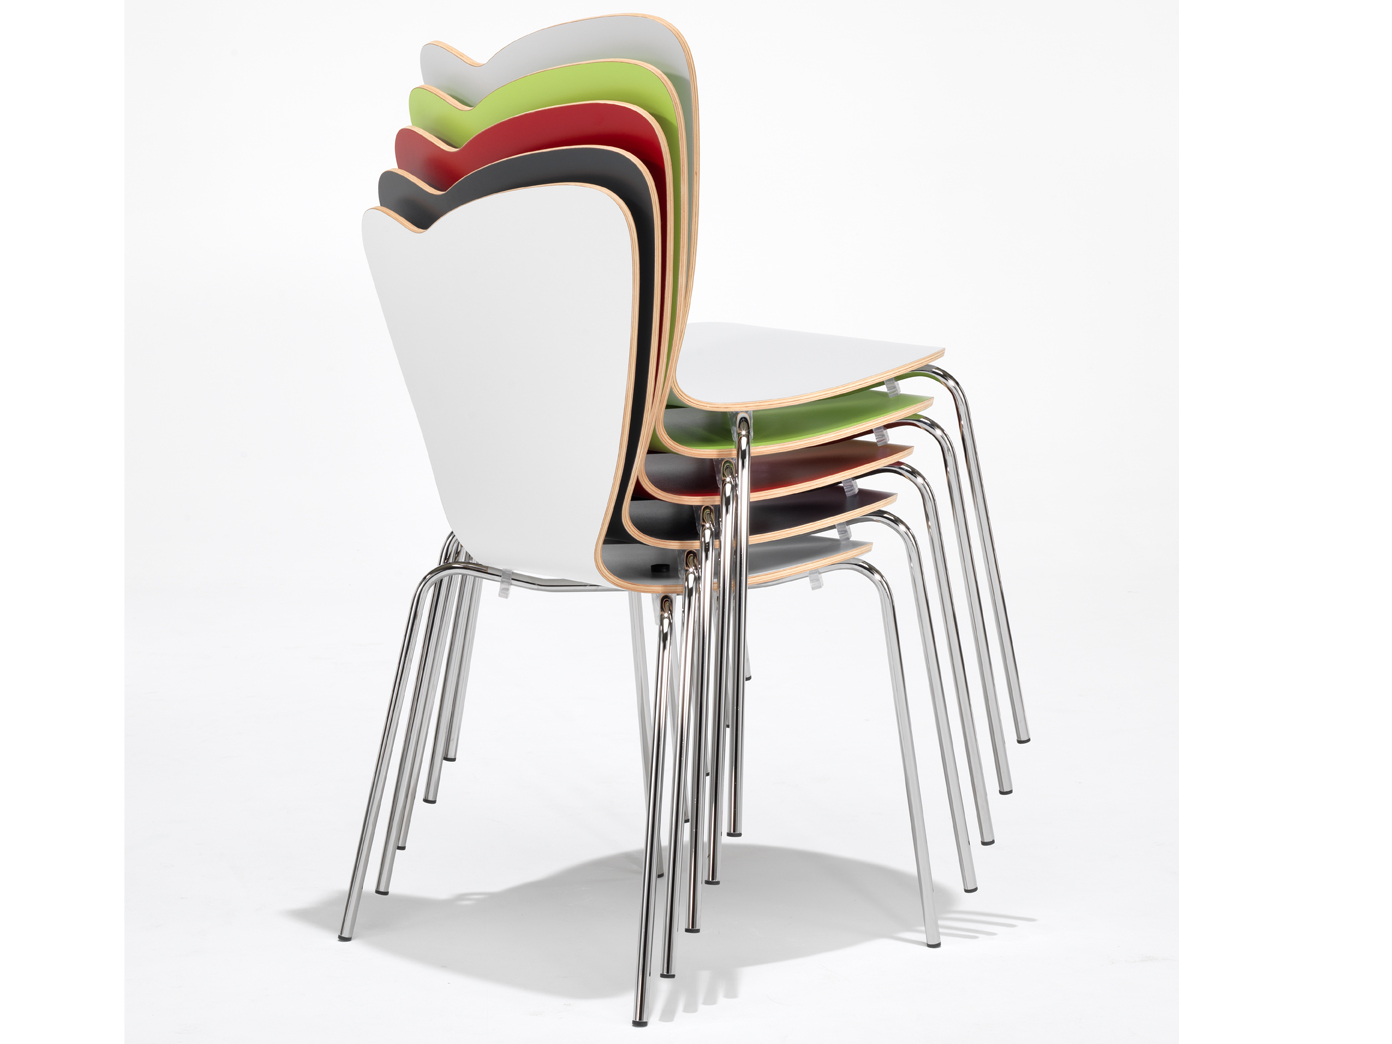 Design stuhl heart in grau stapelstuhl esszimmerstuhl for Design schalenstuhl